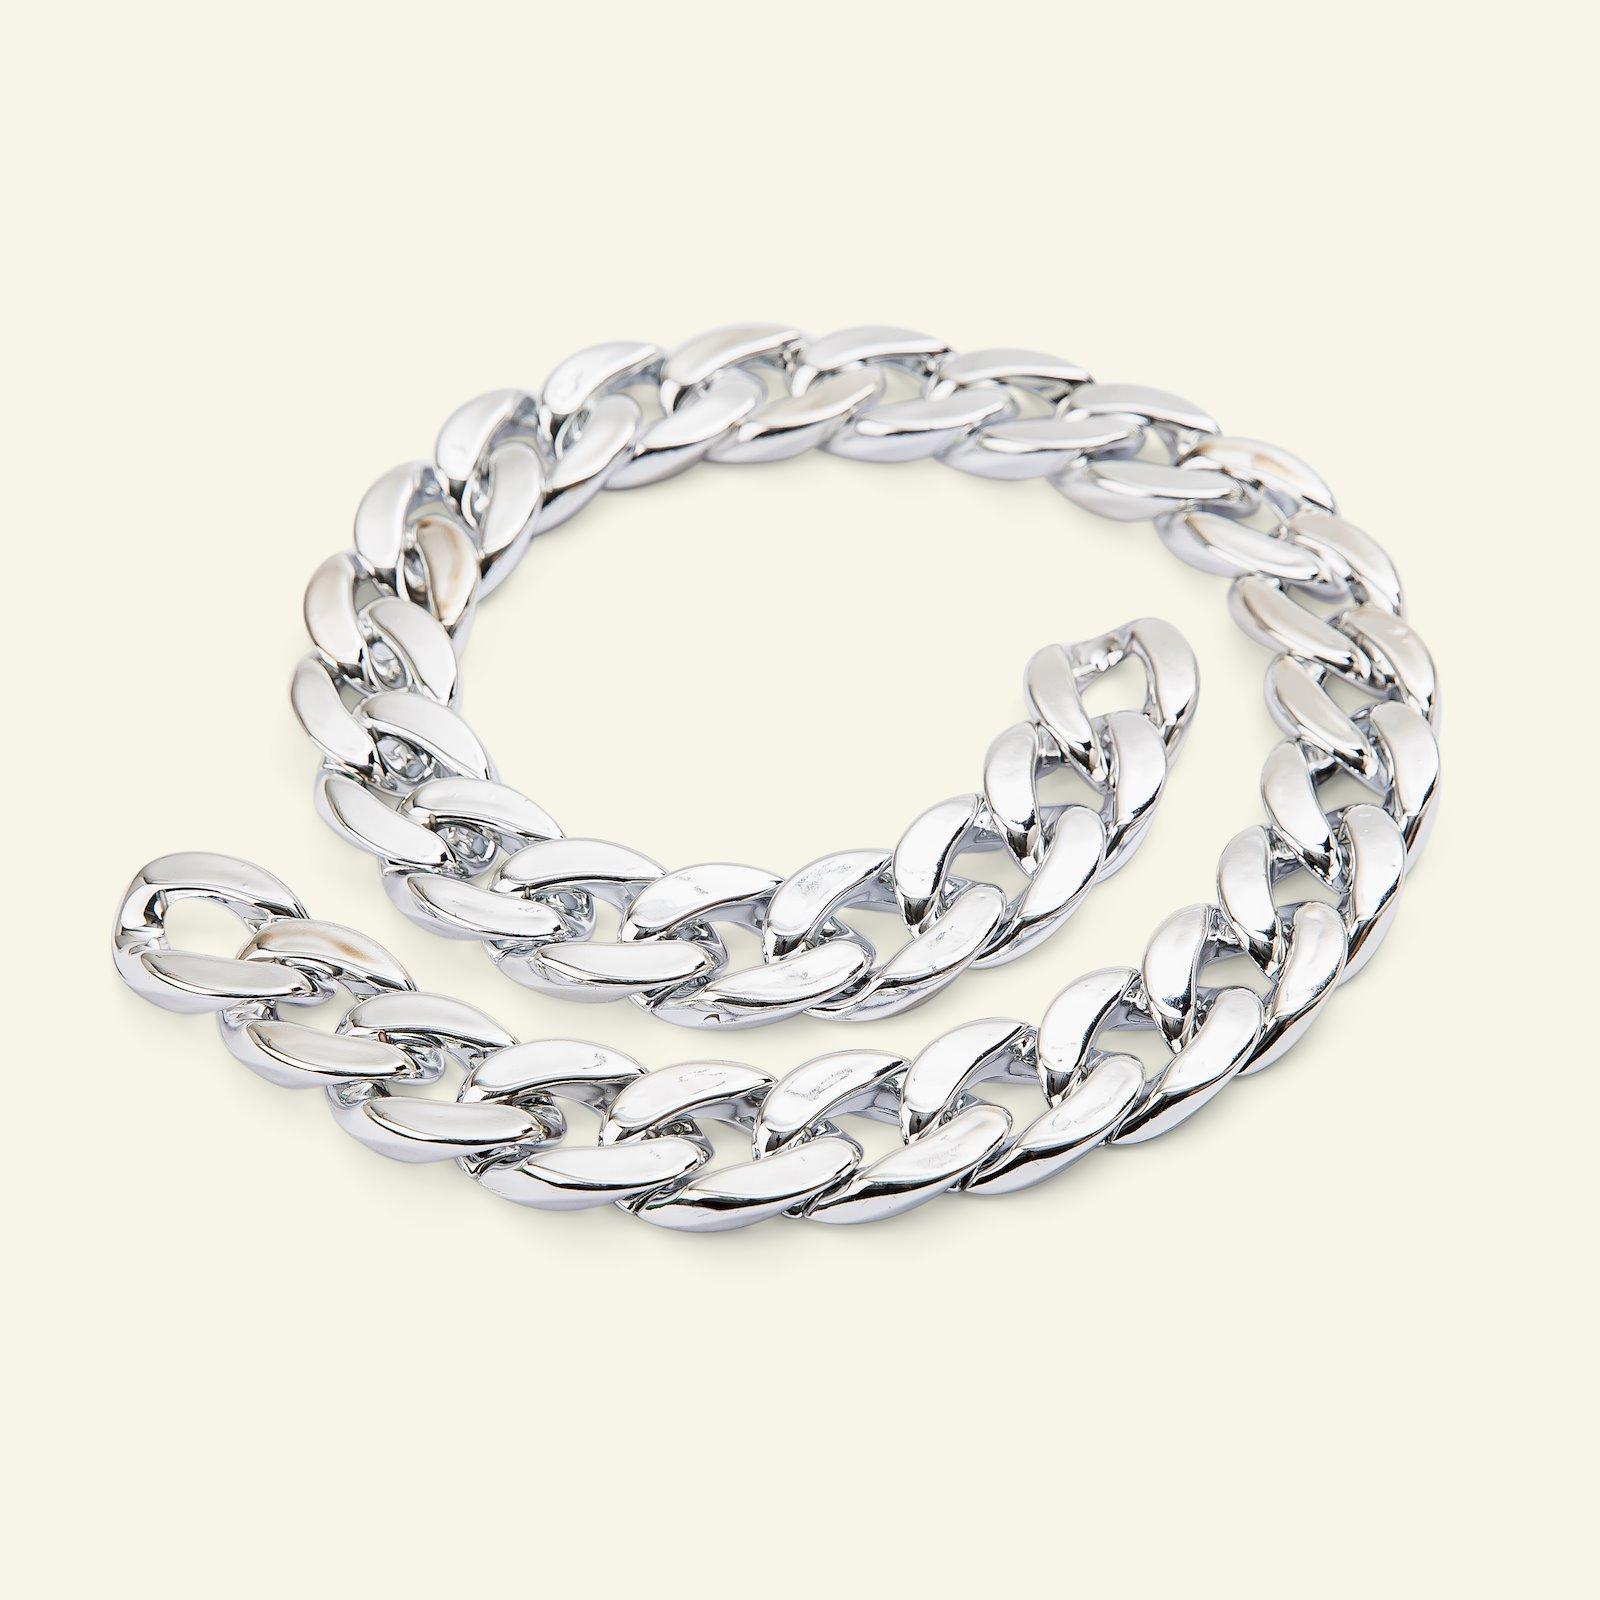 Polyester-Kette Silber 150cm 38100_pack